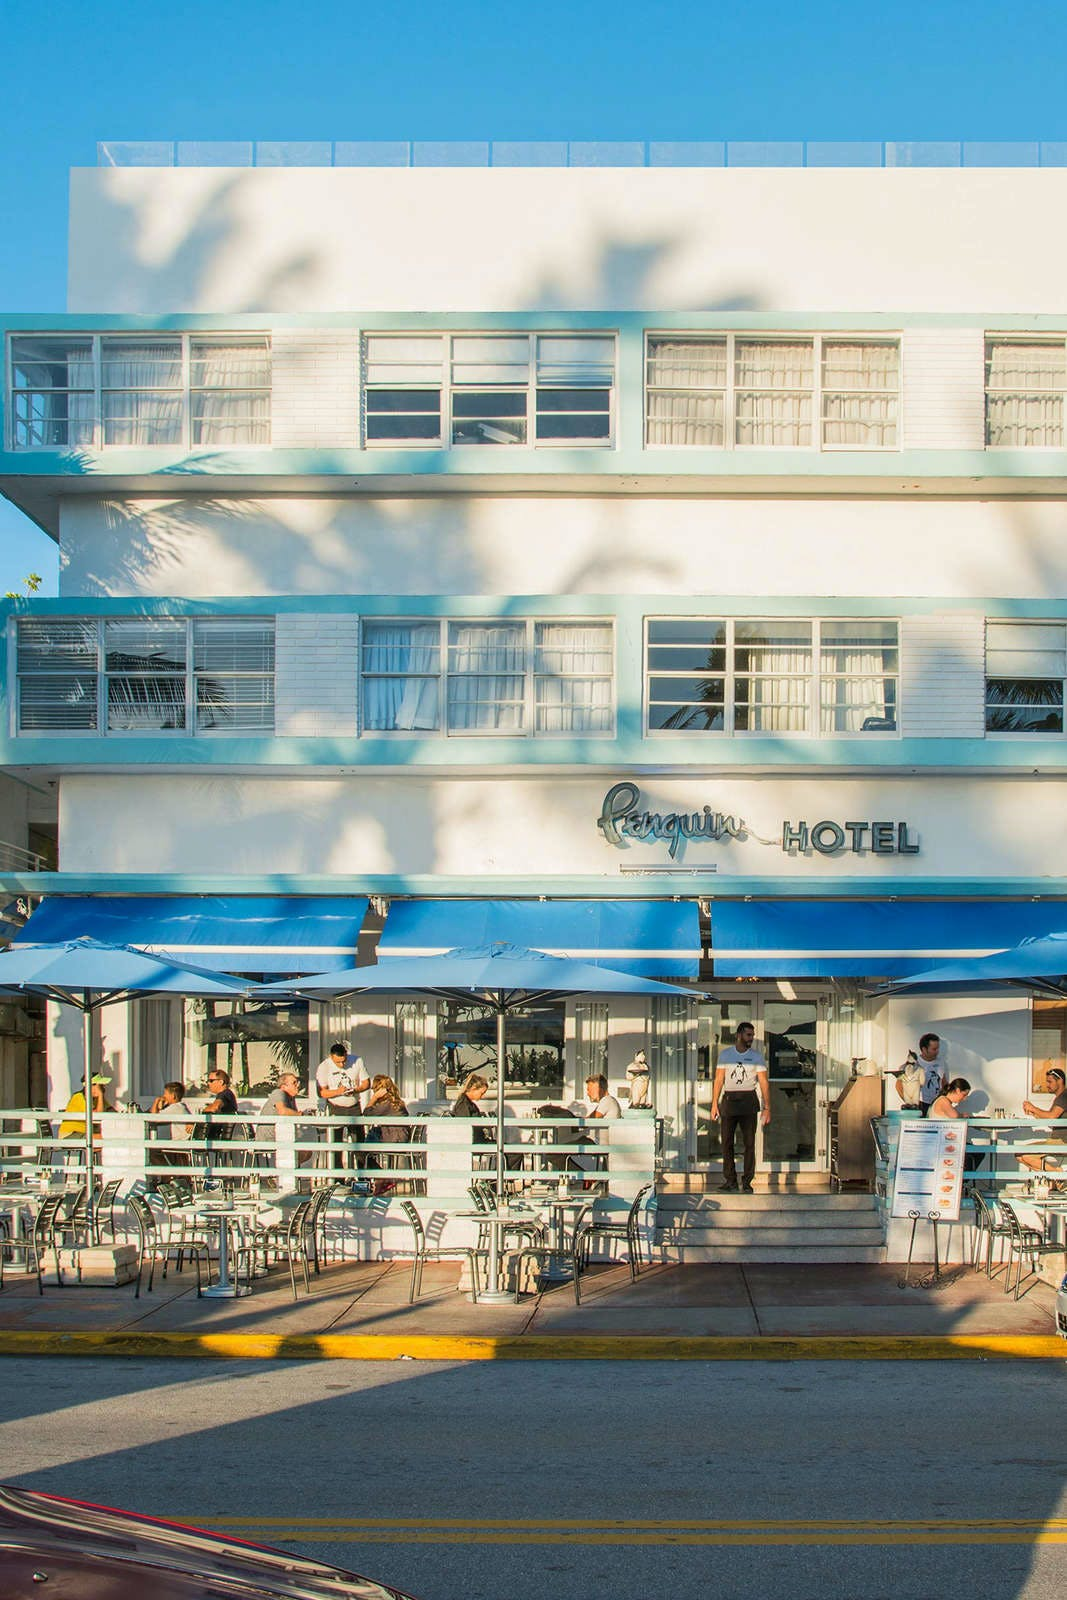 The Penguin Hotel